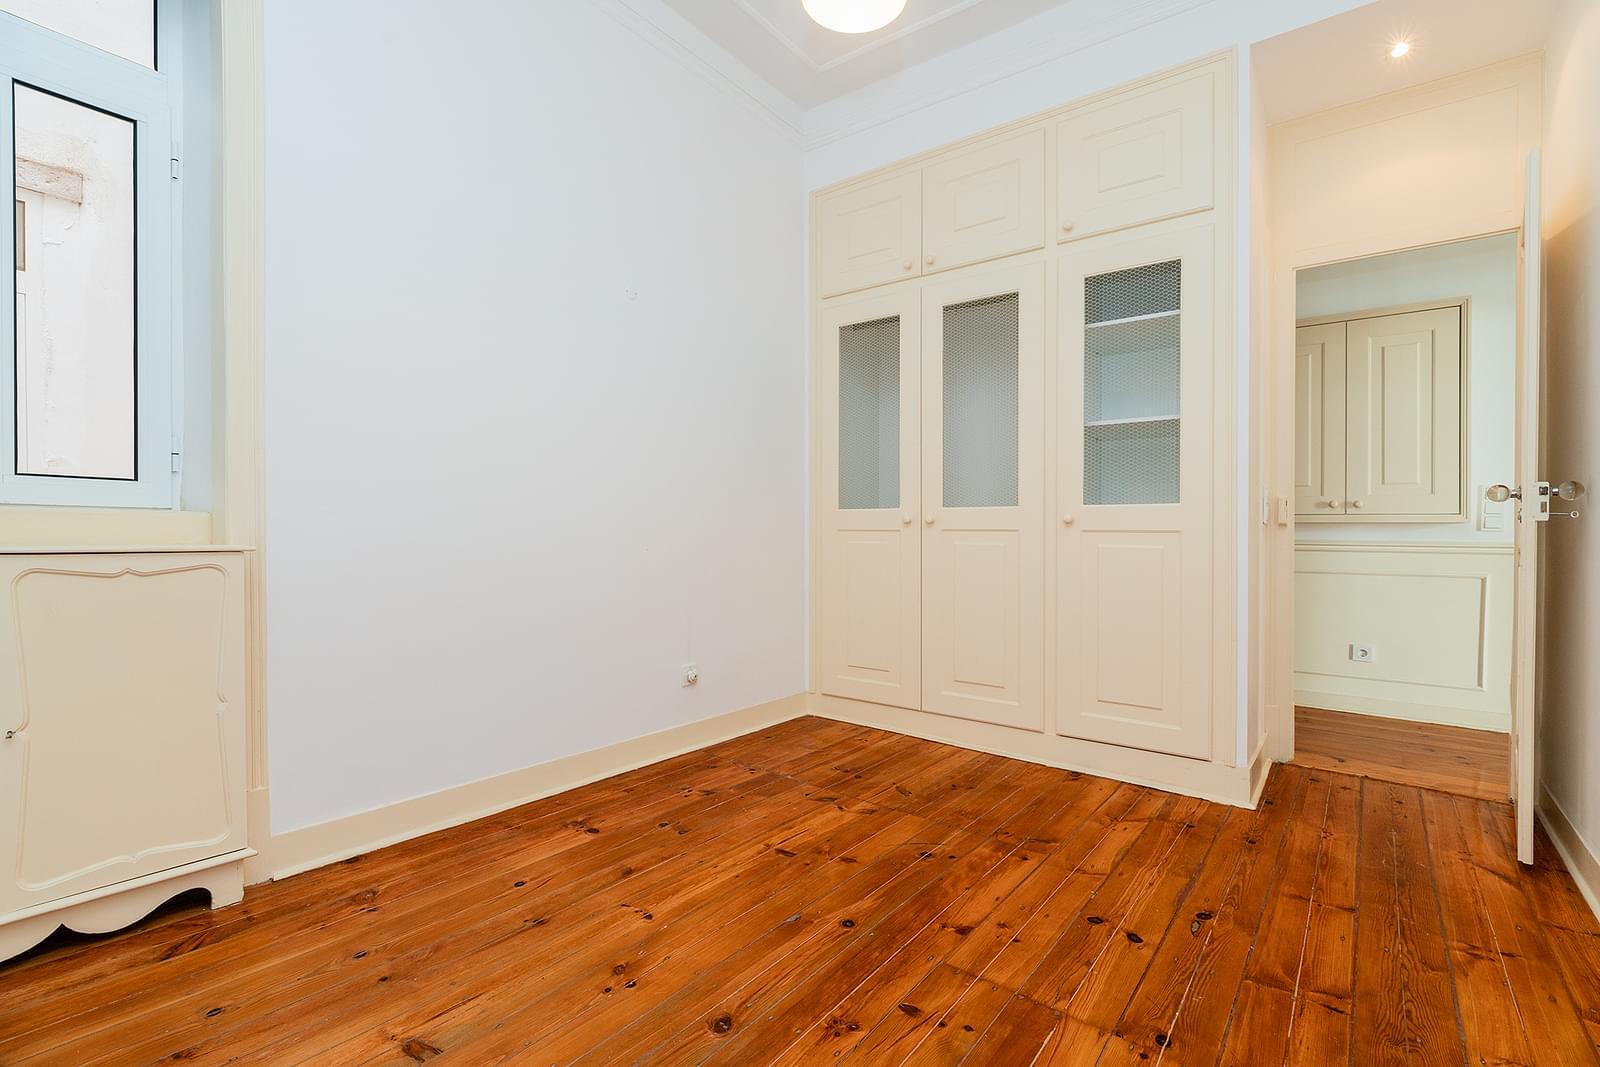 pf18723-apartamento-t3-1-lisboa-ed92898b-8fbd-43b3-9c7f-ea8fd4d109a7